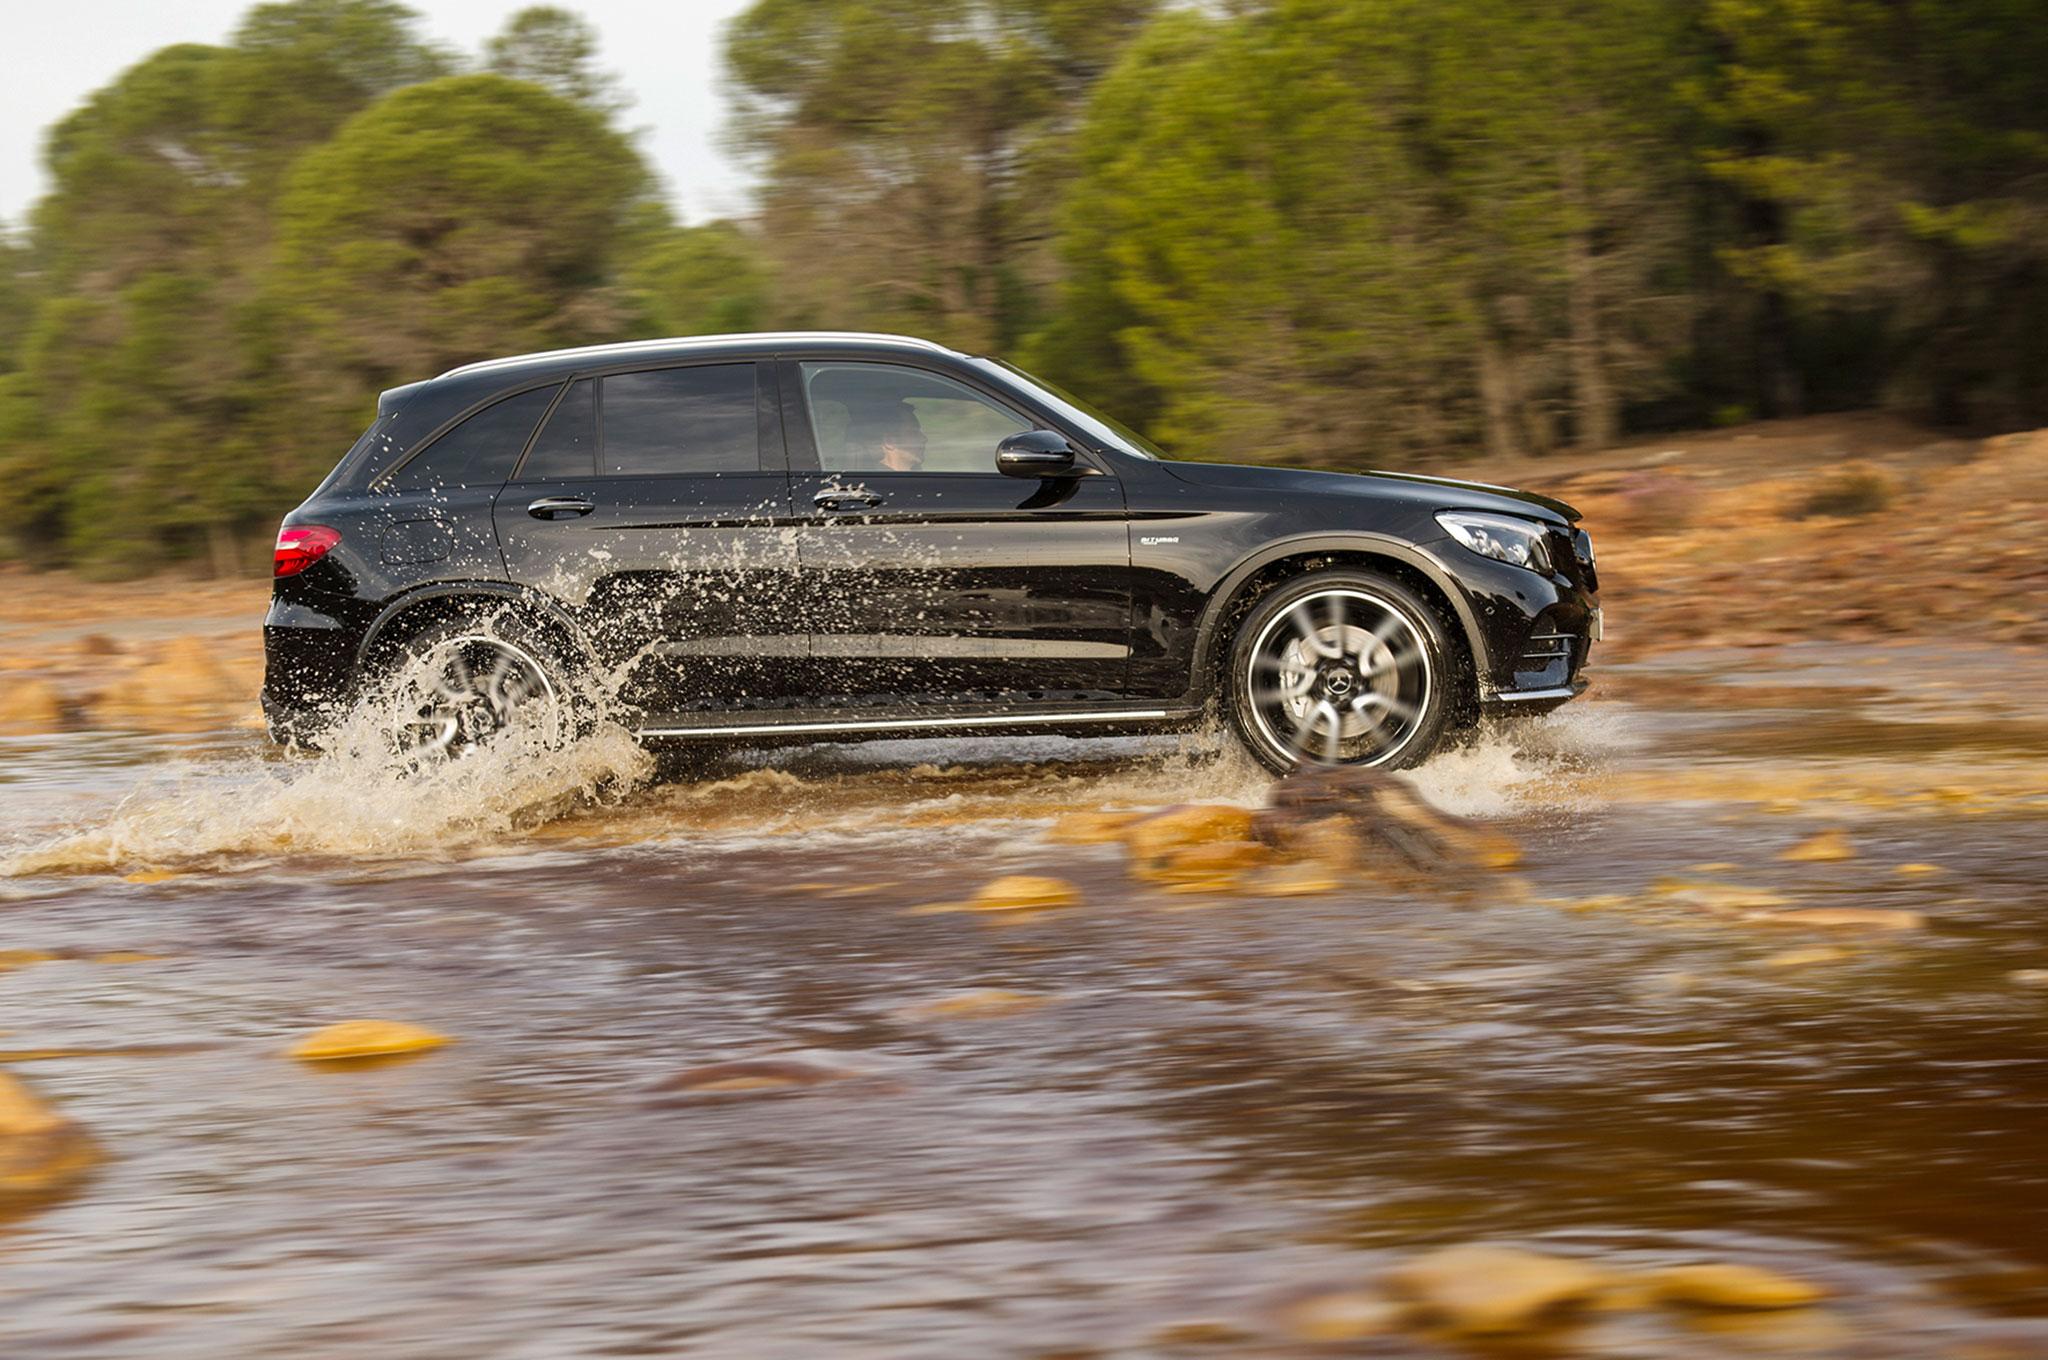 http://st.automobilemag.com/uploads/sites/11/2016/03/2017-Mercedes-AMG-GLC43-side-profile-in-motion.jpg